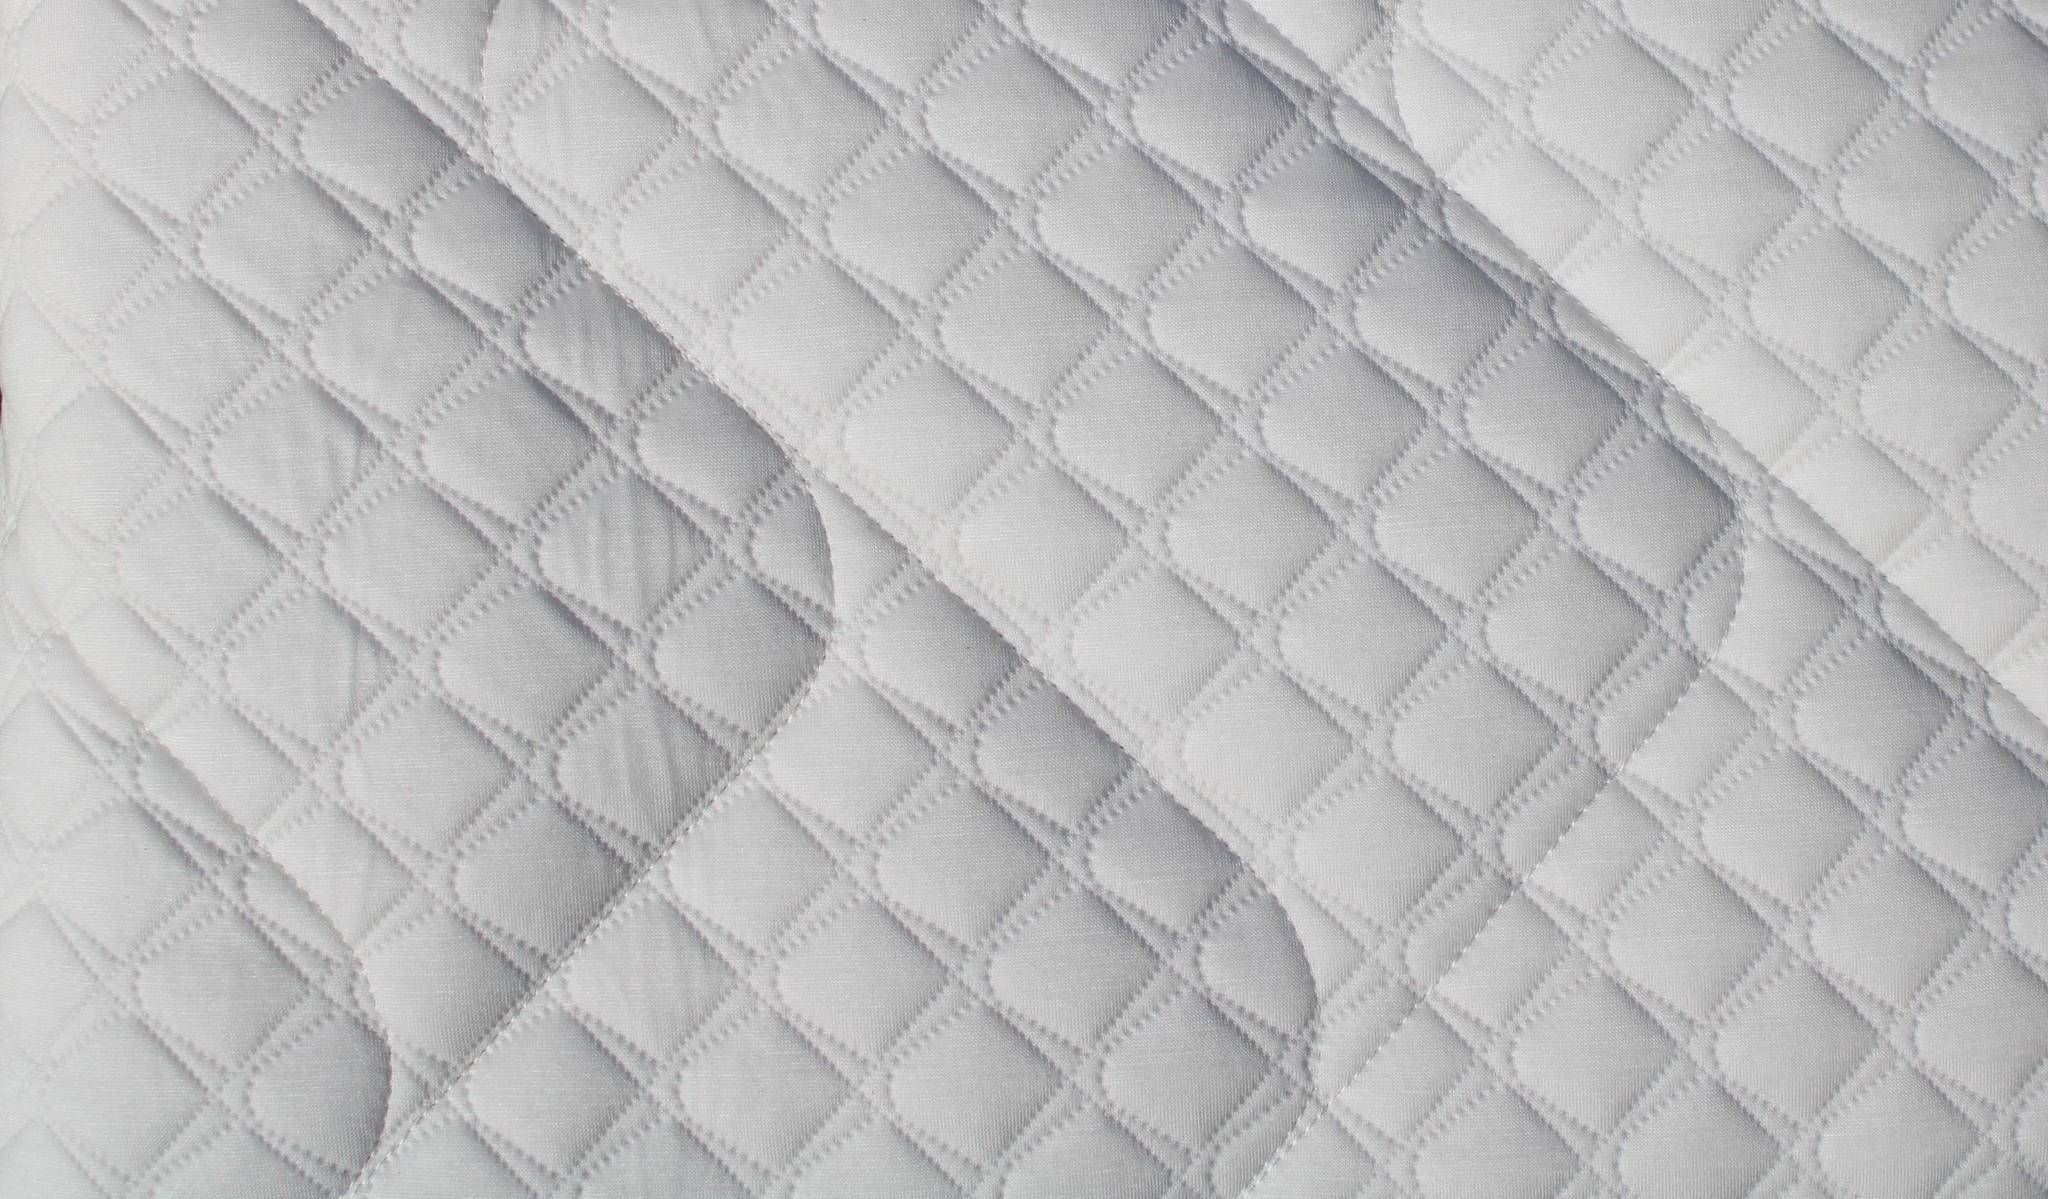 Sarpy Kindermatras 80x185 Sertel Tailor Made Mattress